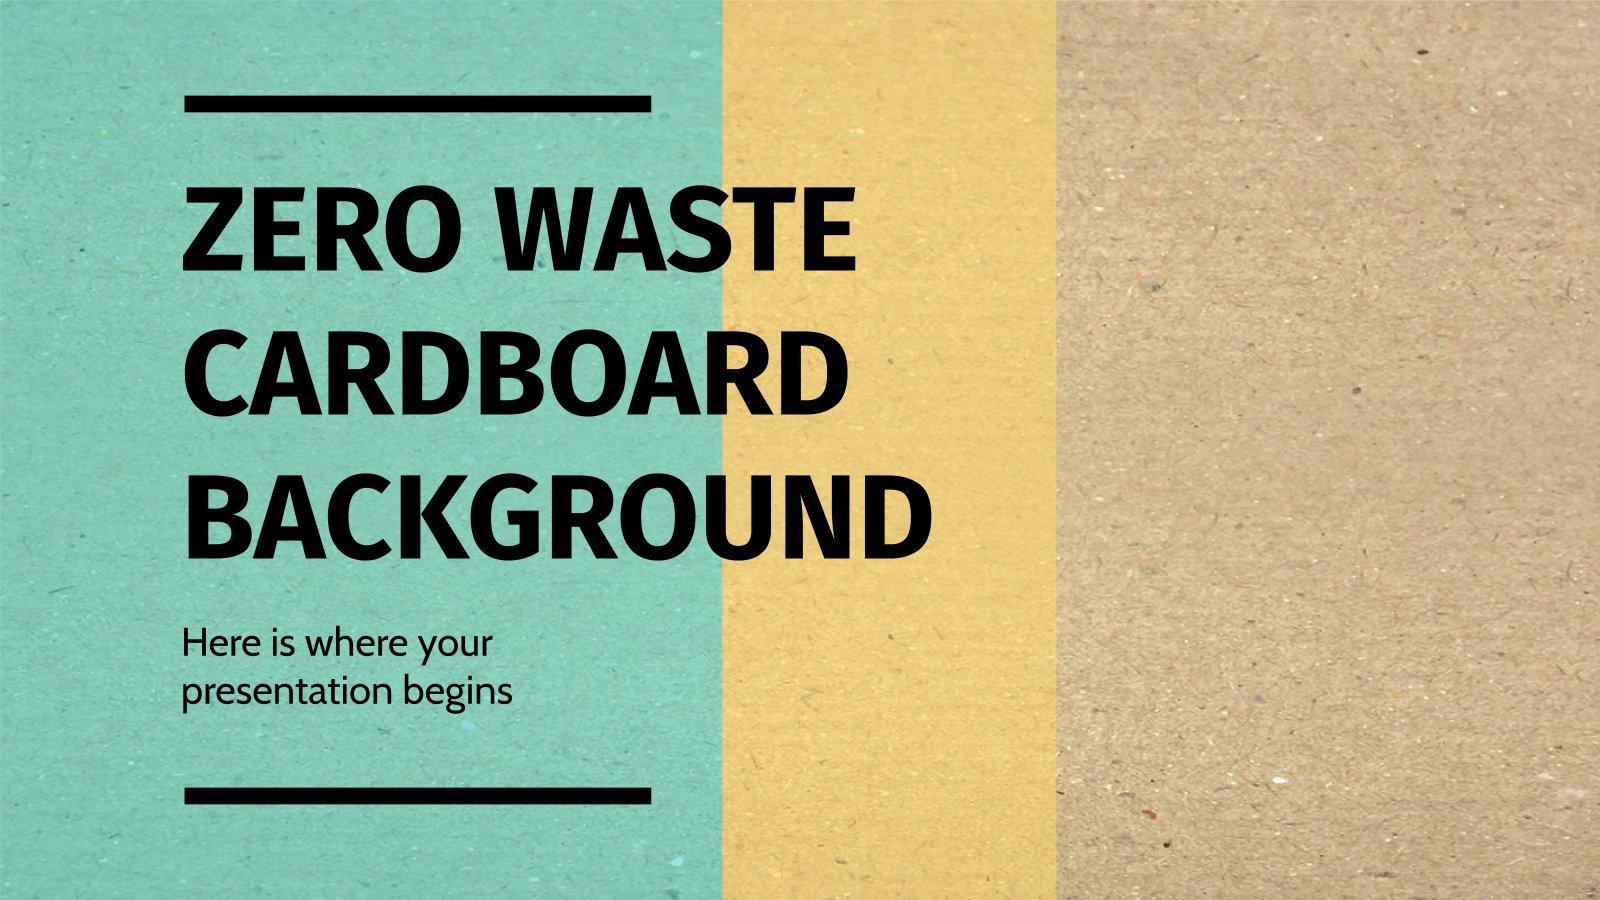 Plantilla de presentación Fondos de cartón cero residuos